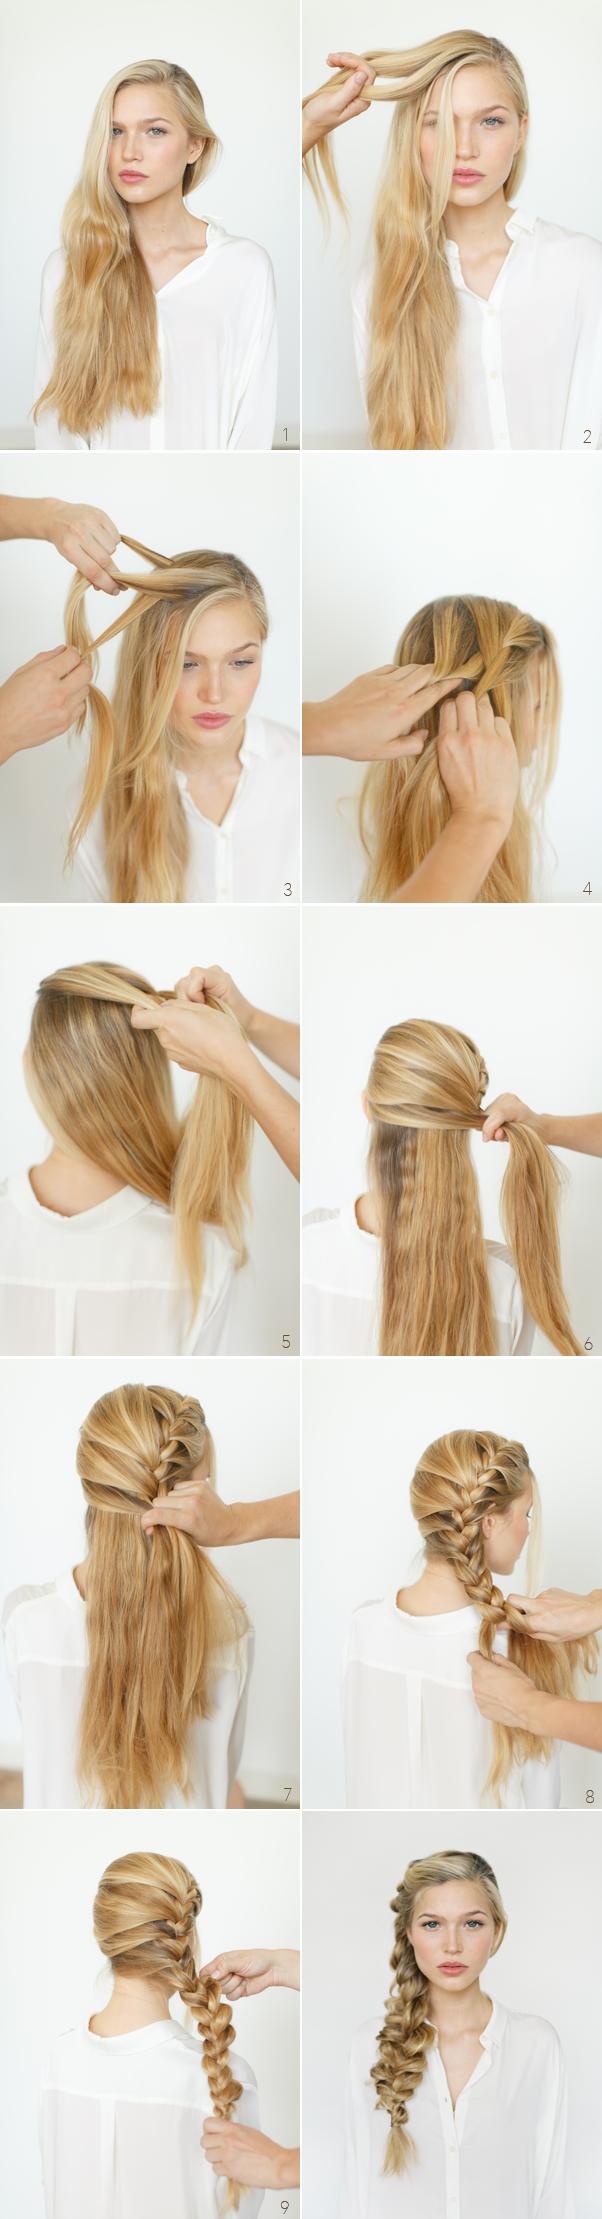 romantic side braid hair tutorial | diy wedding tutorials